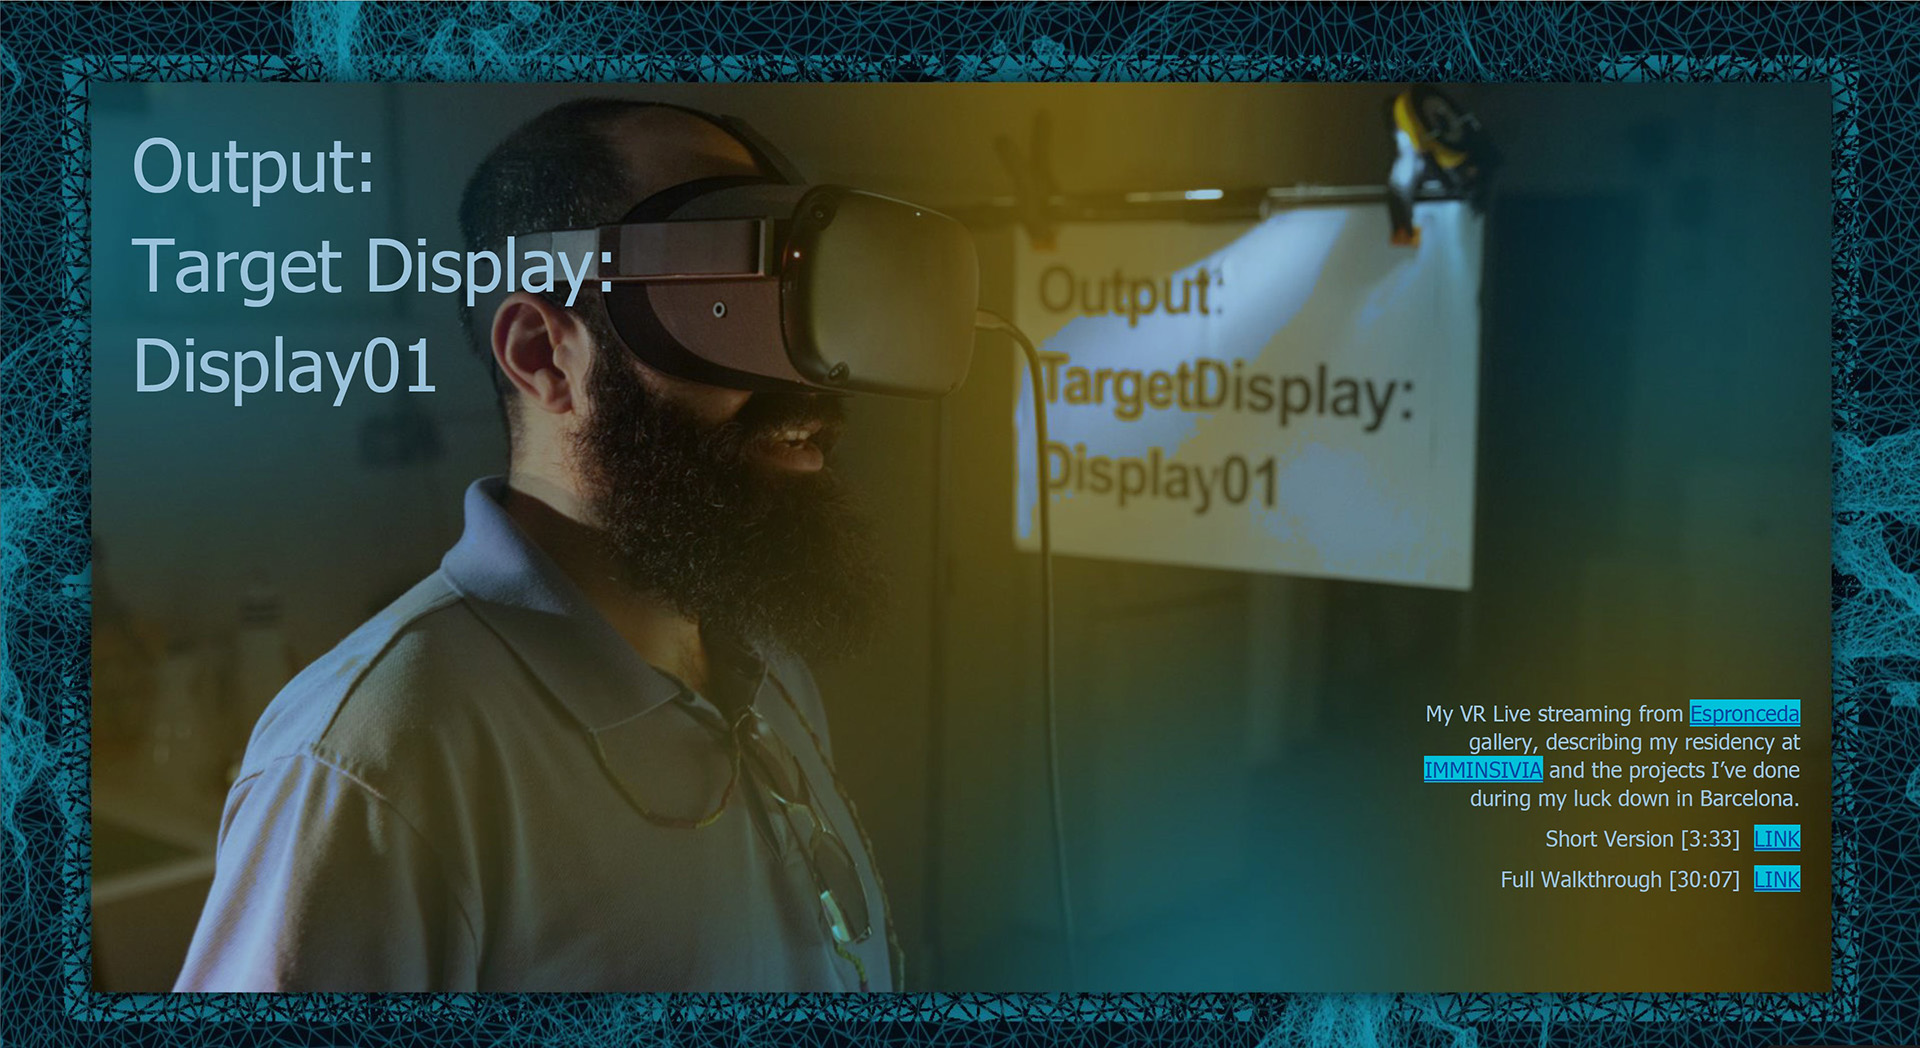 Output:TargetDisplay: Display01